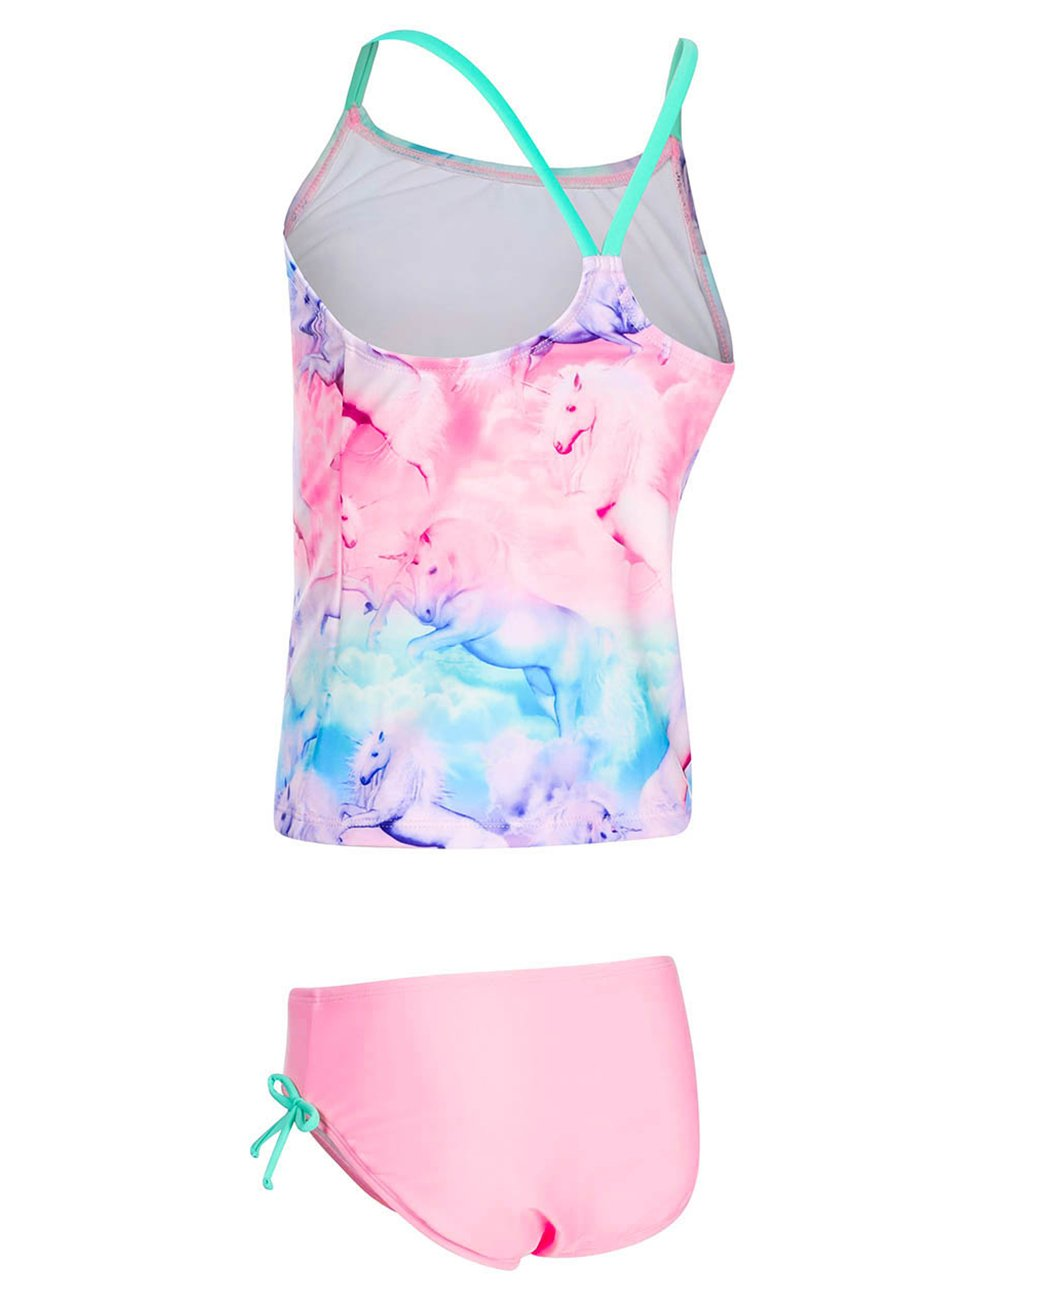 iDrawl Girls Two Piece Swimwear, Racerback Beach Swimming Bathing Suits by iDrawl (Image #4)